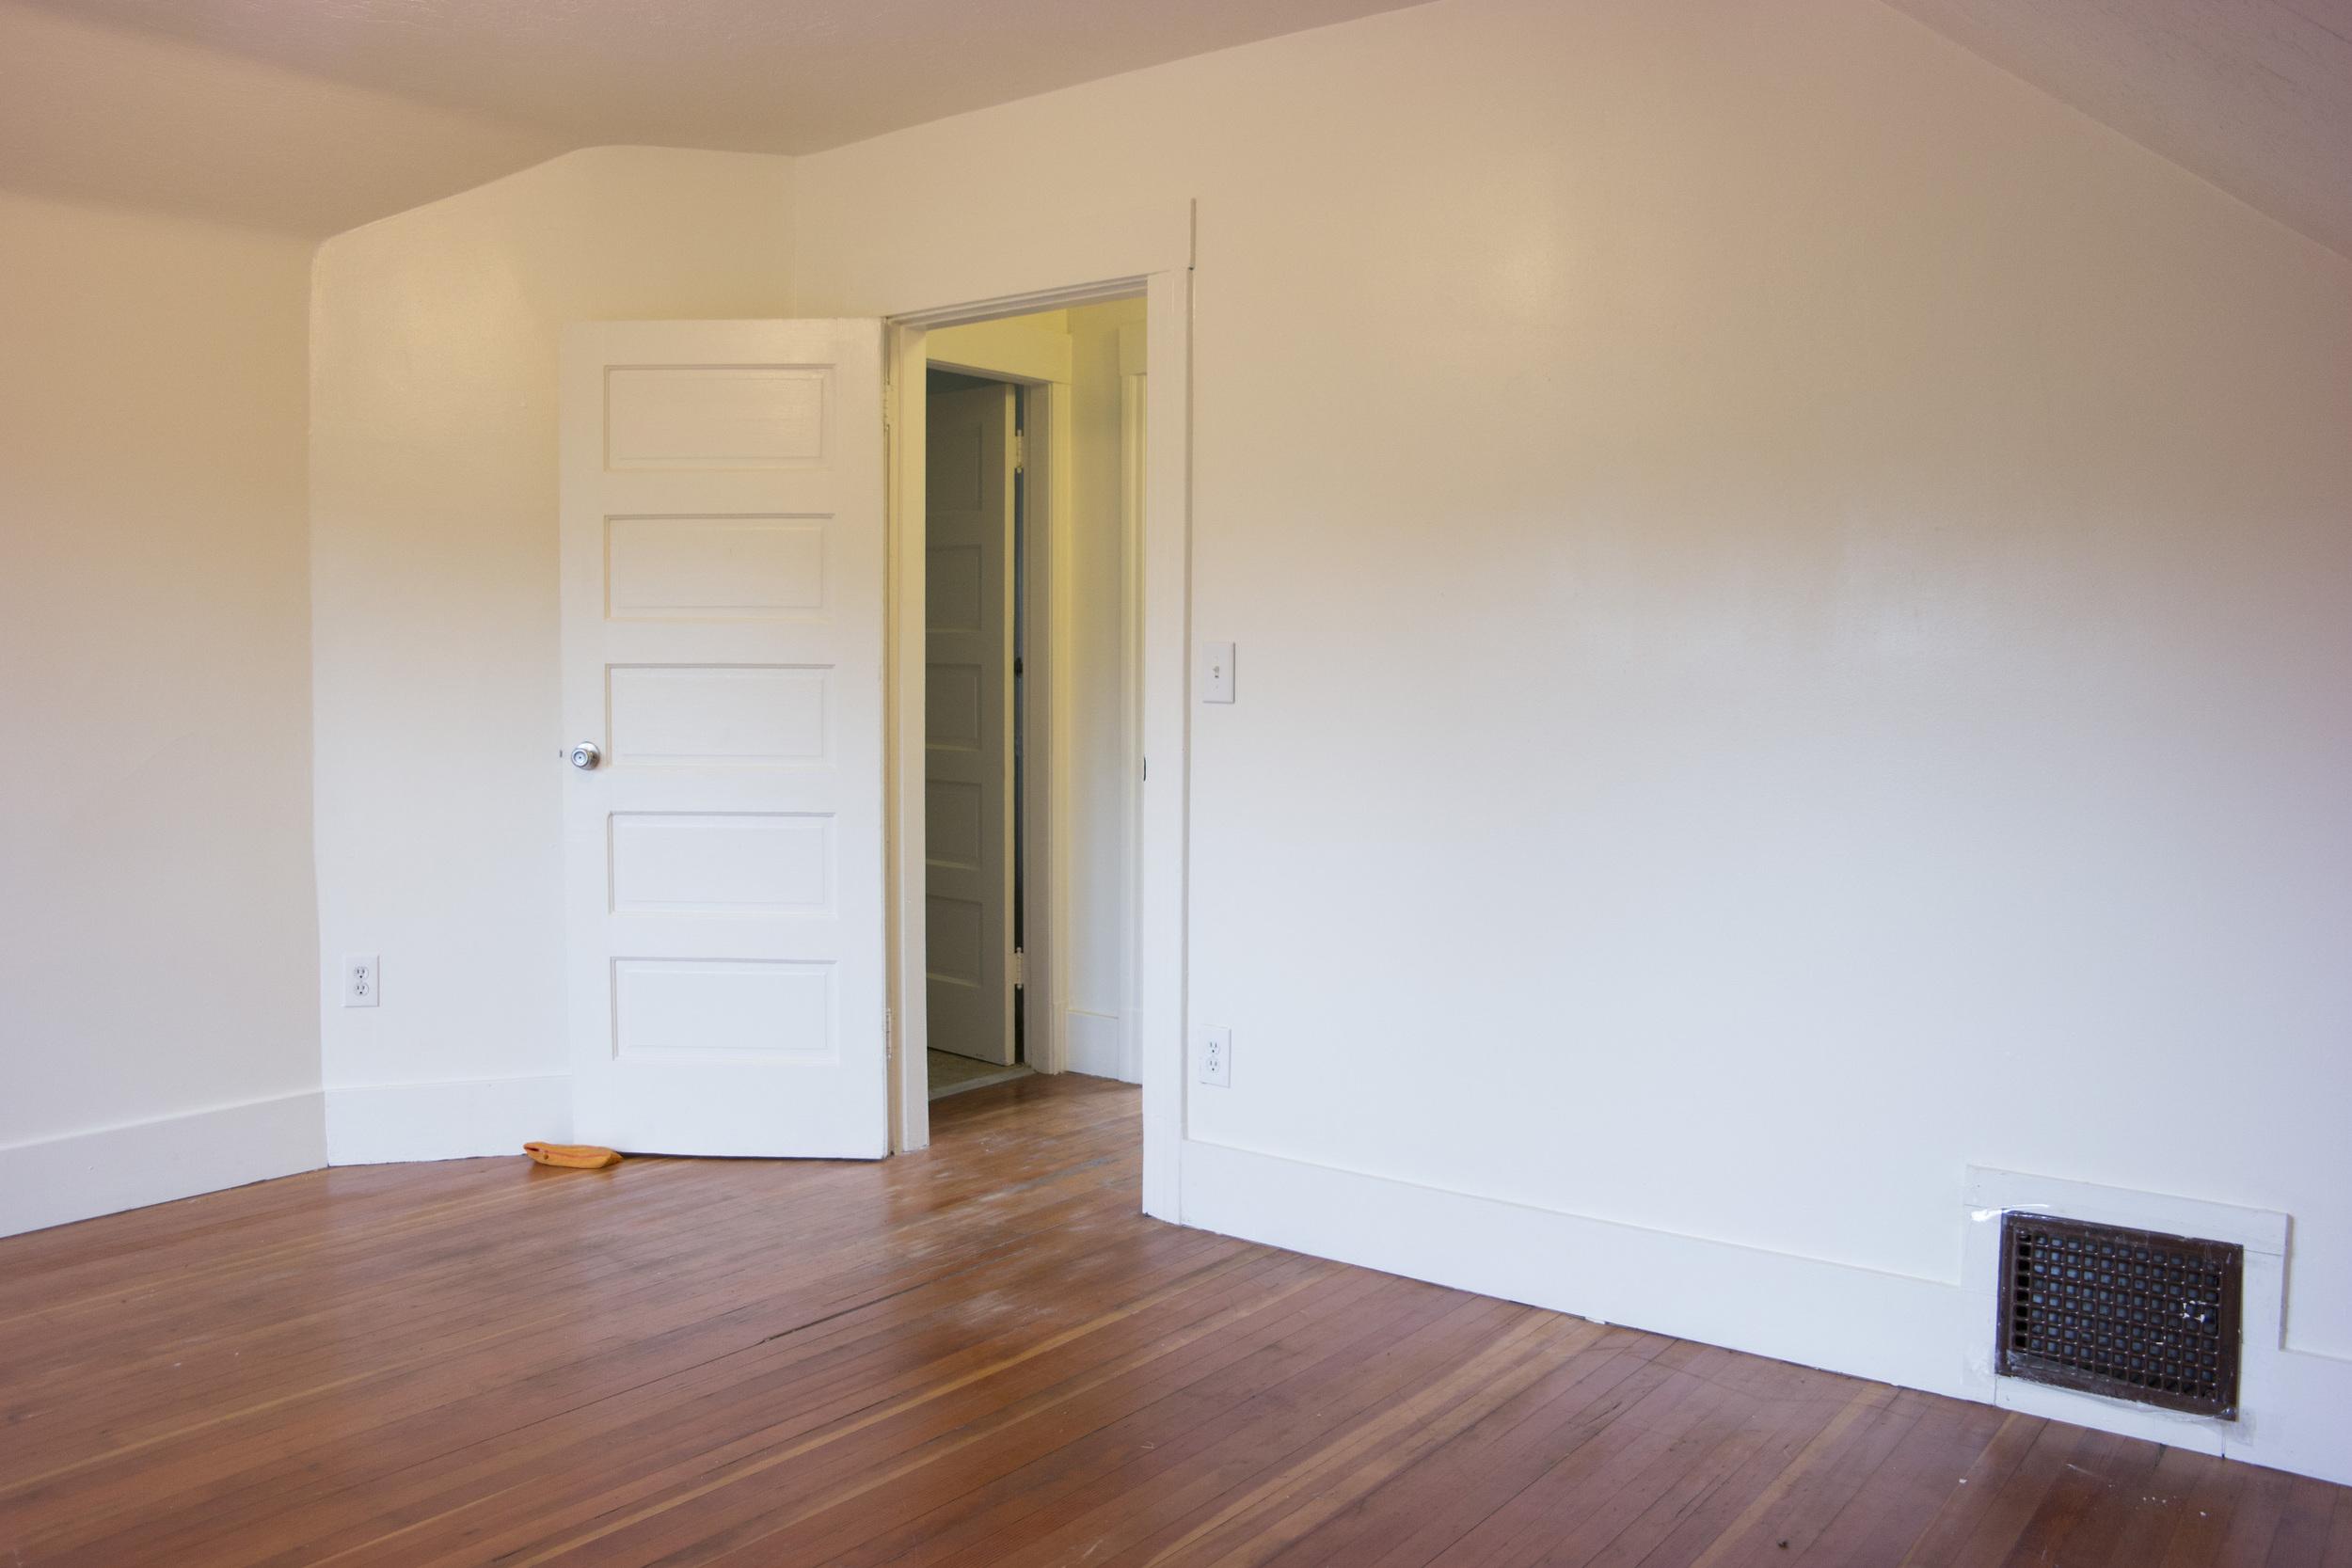 14-2Bedroom2.jpg